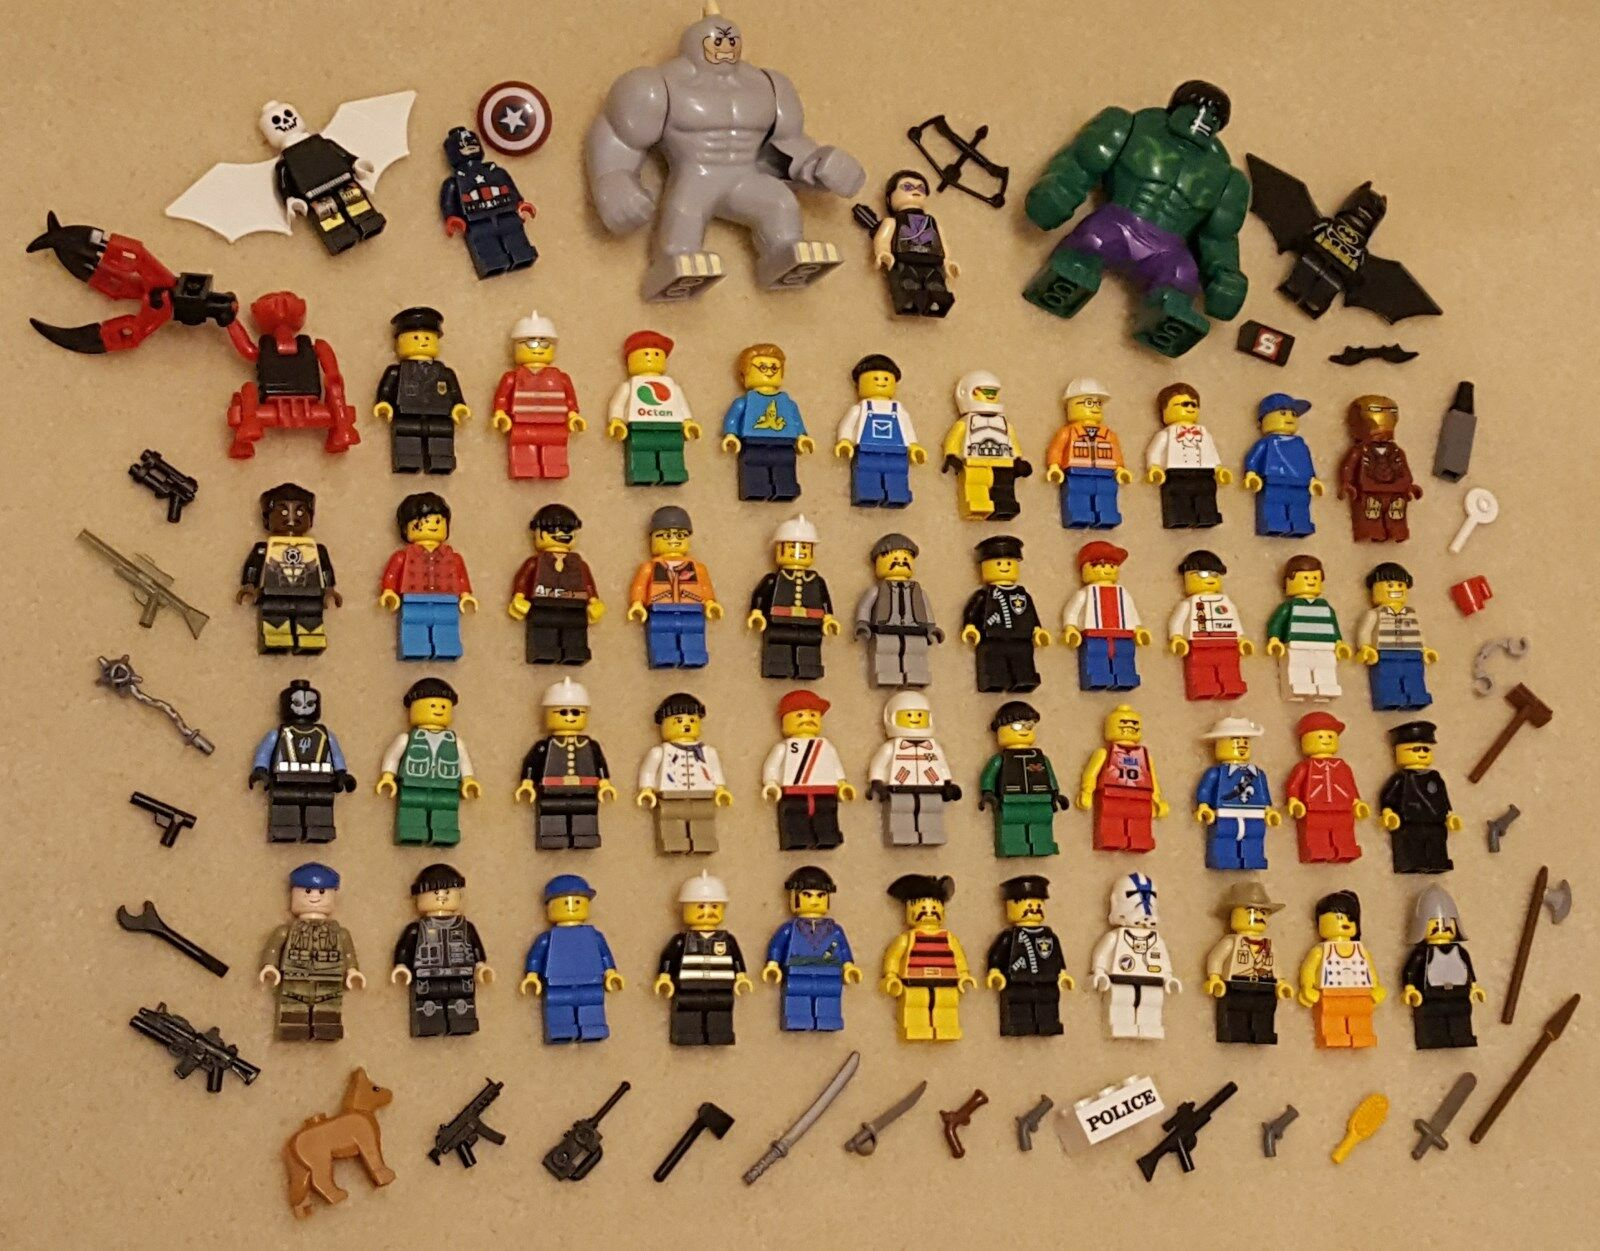 50 Lego Minifigures & Off-brand Minifigures Lot People Hulk Police Super-heroes